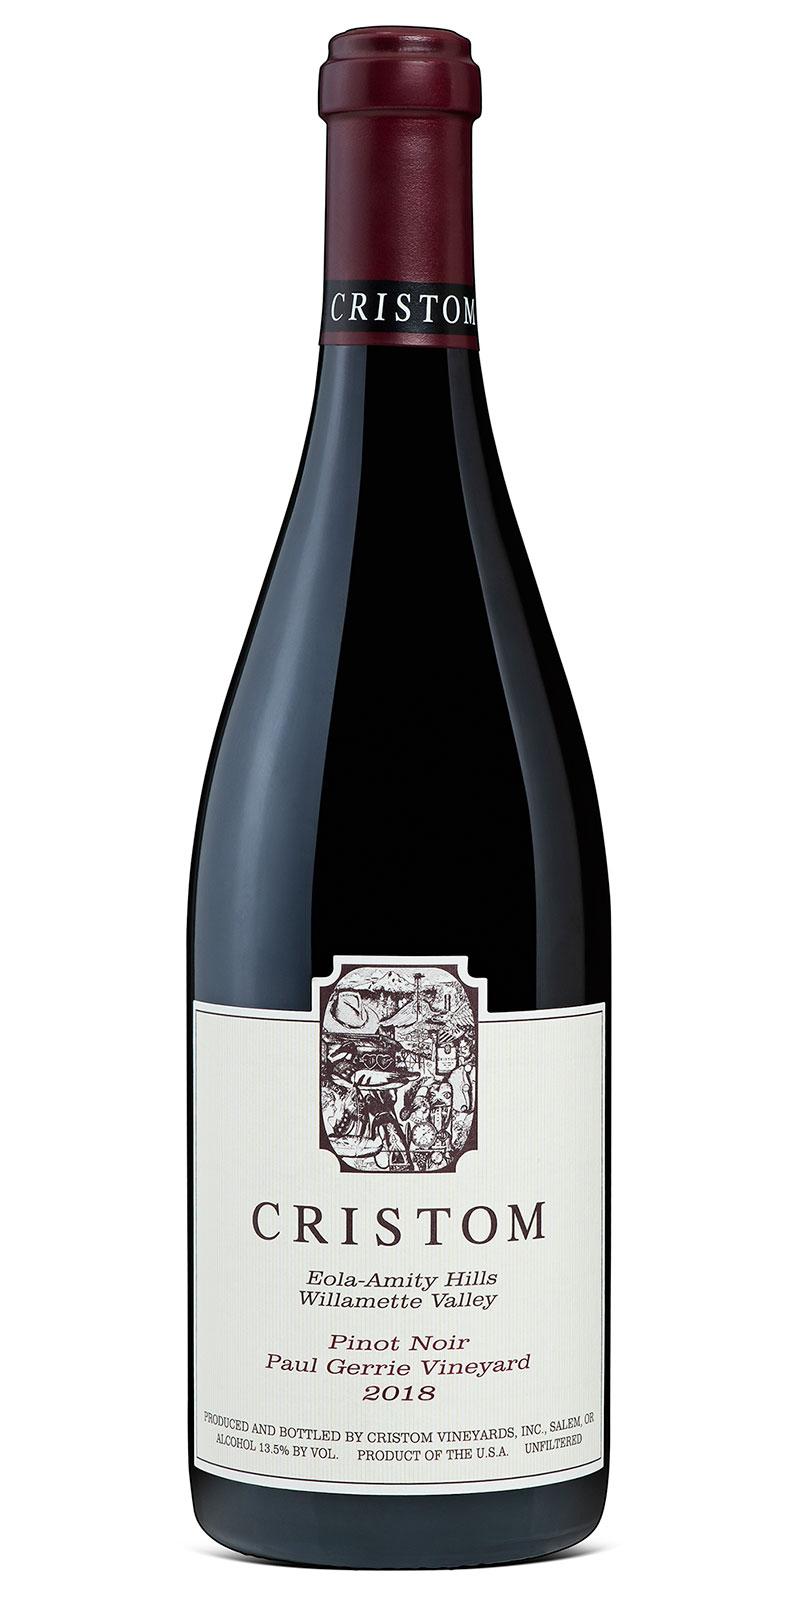 Cristom Eola-Amity Hills Willamette Valley Pinot Noir Paul Gerrie Vineyard 2018 bottle